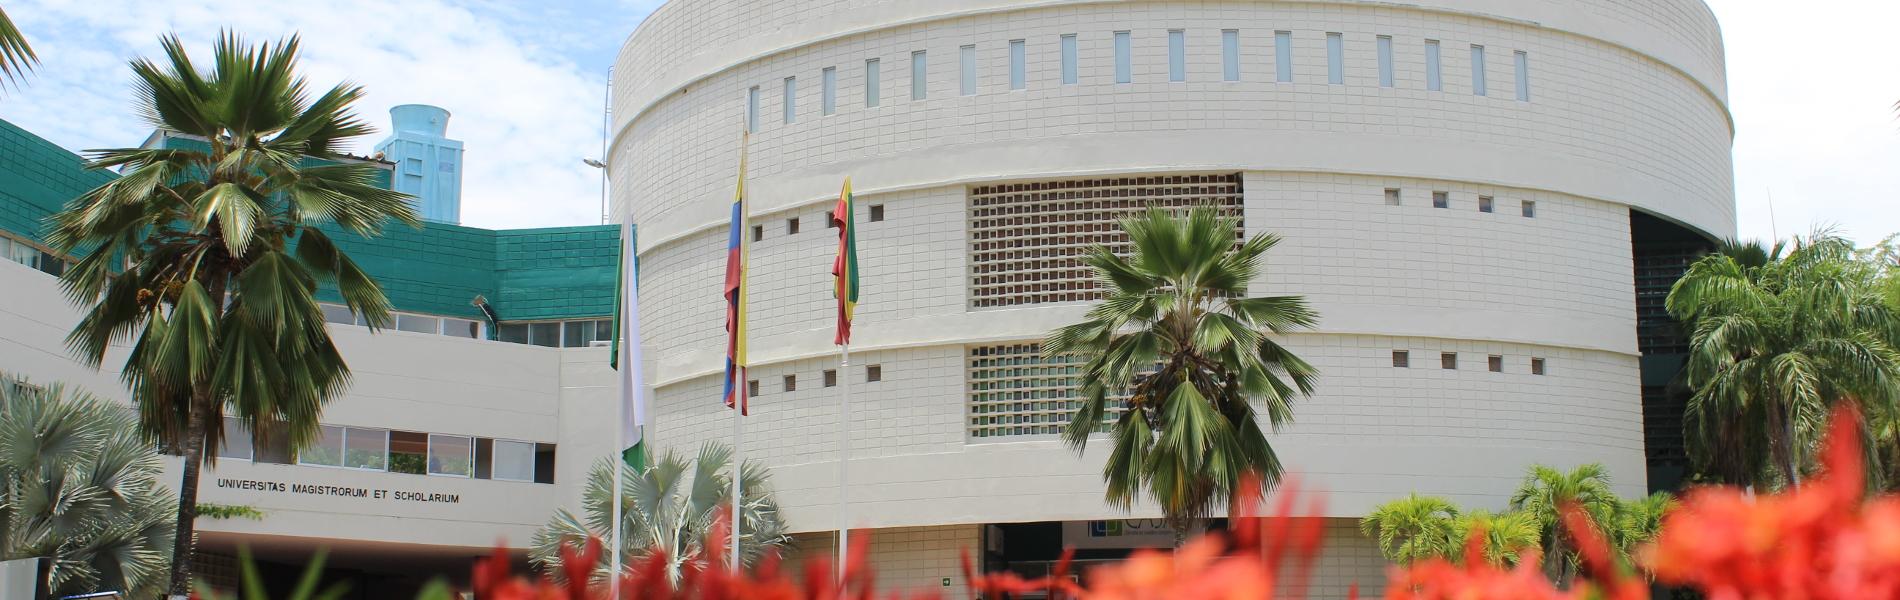 Universidad Tecnológica de Bolívar